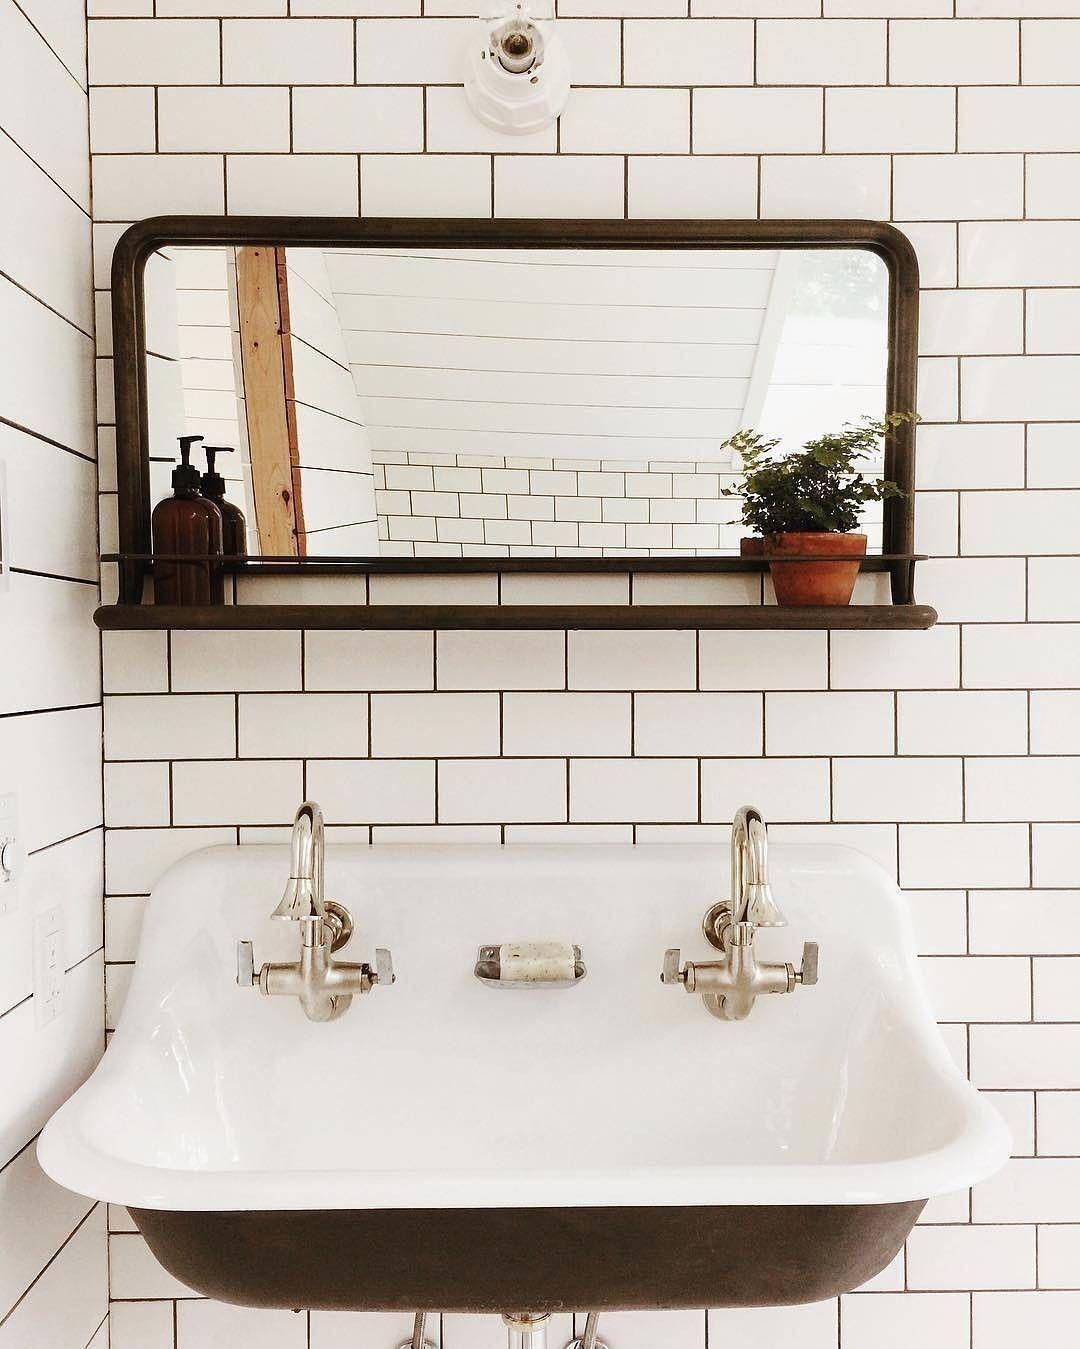 Clean Cool Norfolksconce Ceramiclighting Schoolhouseelectric Via Saraparsons Stylish Bathroom Vintage Bathroom Bathroom Decor